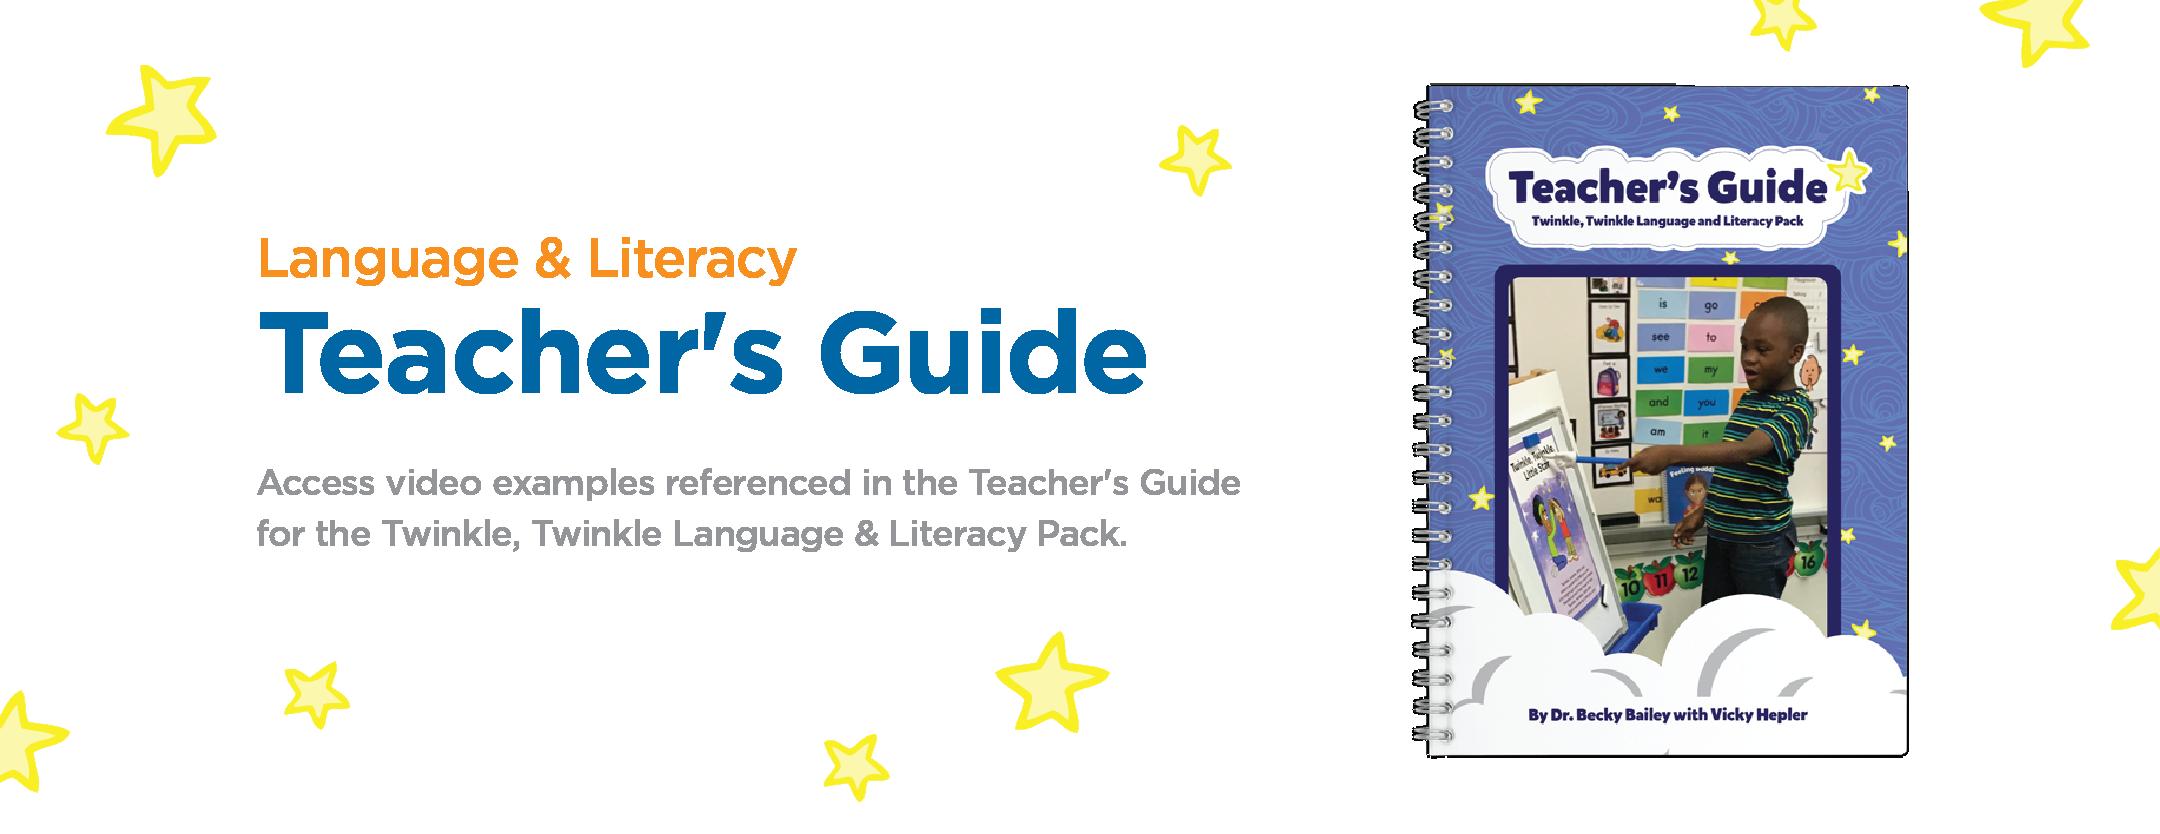 Language & Literacy: Teacher's Guide